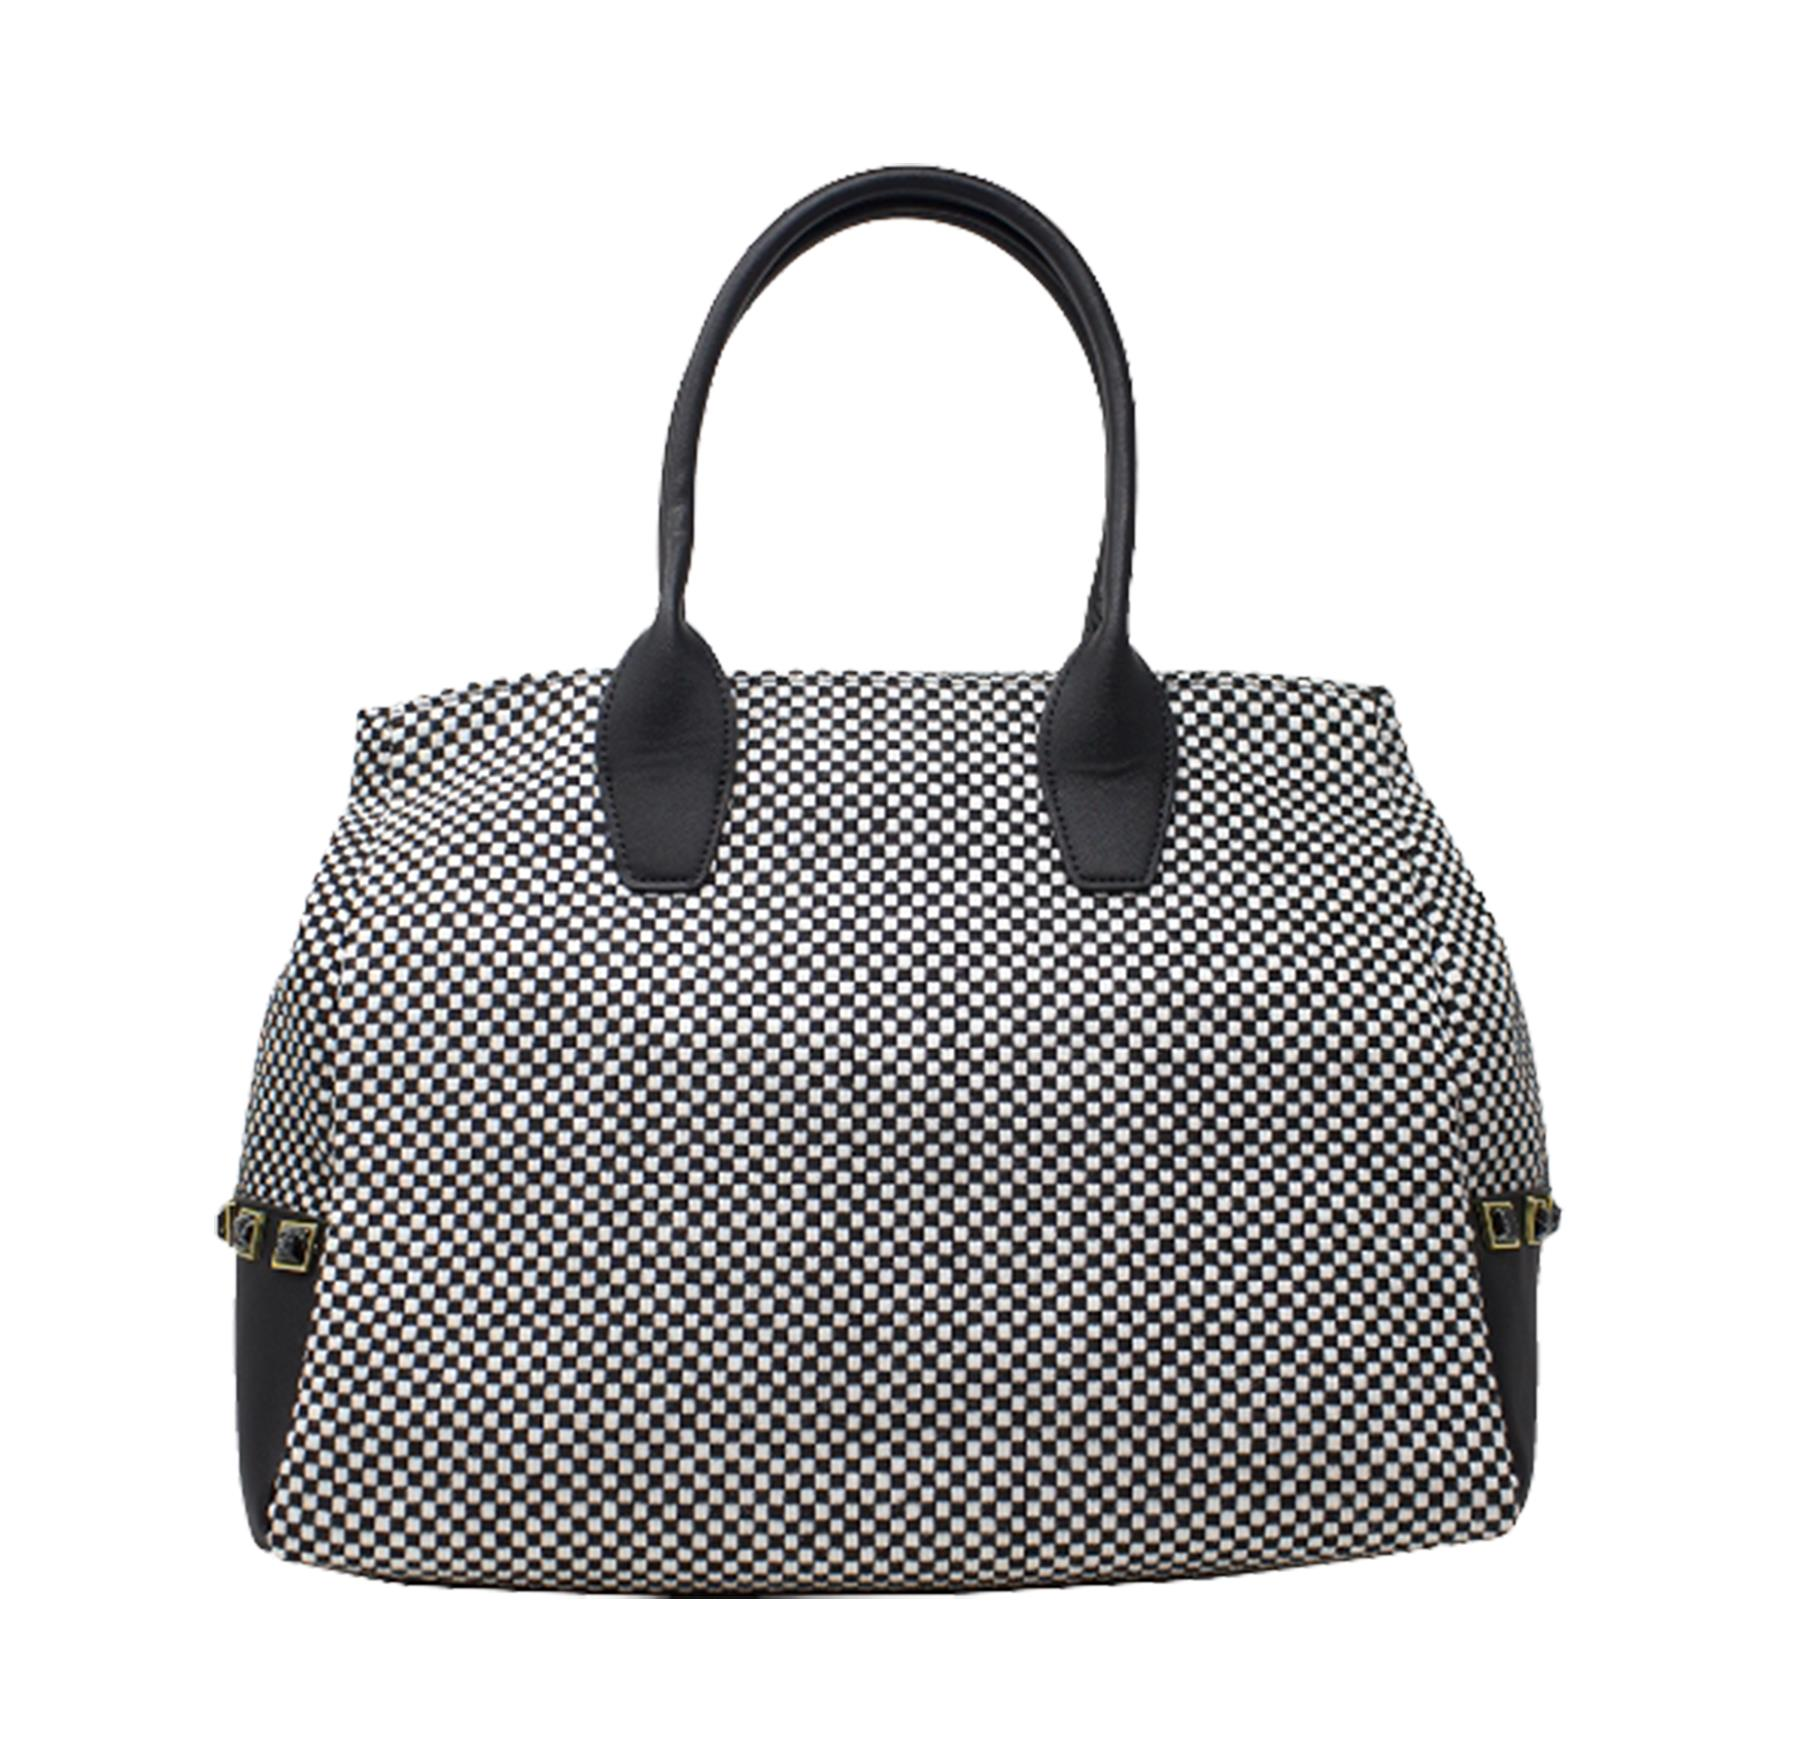 New-Women-s-Small-Check-Pattern-Studded-Design-Tote-Bag-Handbag thumbnail 6